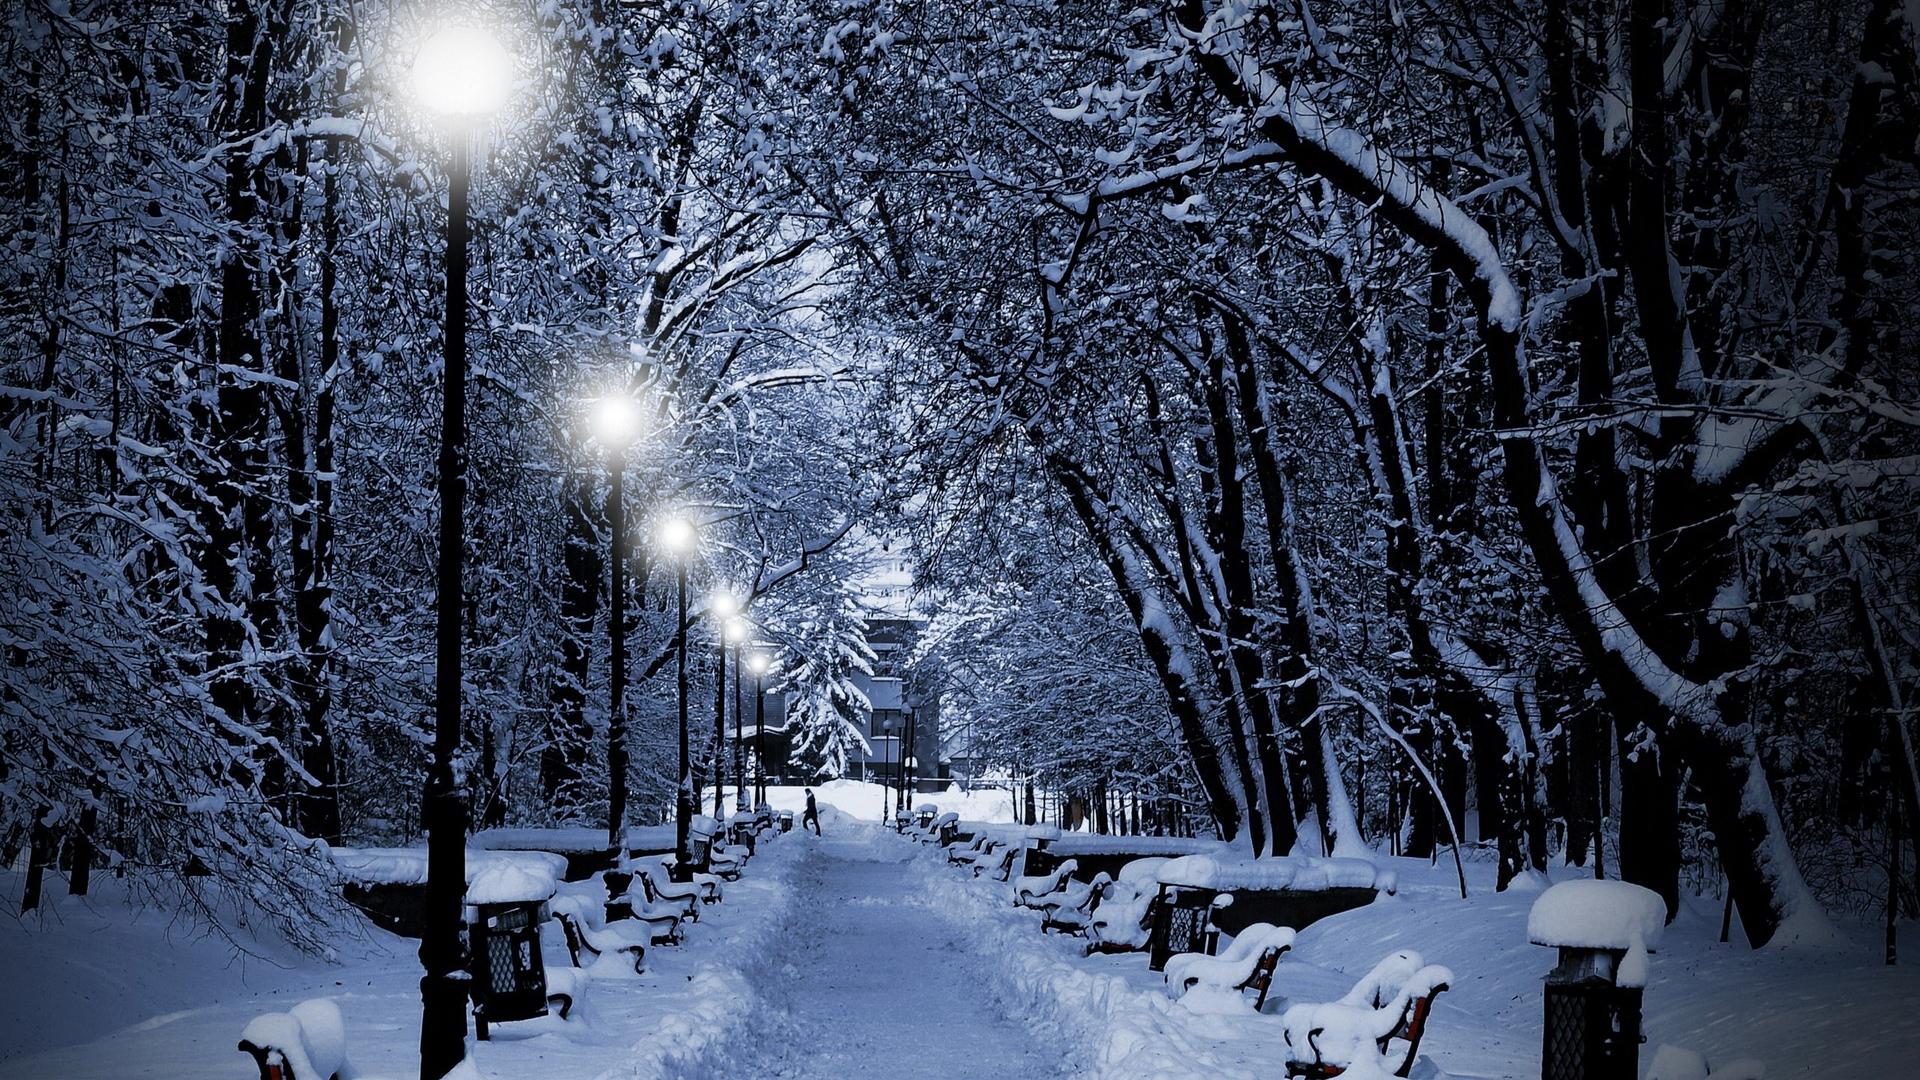 Download Wallpaper 1920x1080 Park Winter Twilight Lamps Light